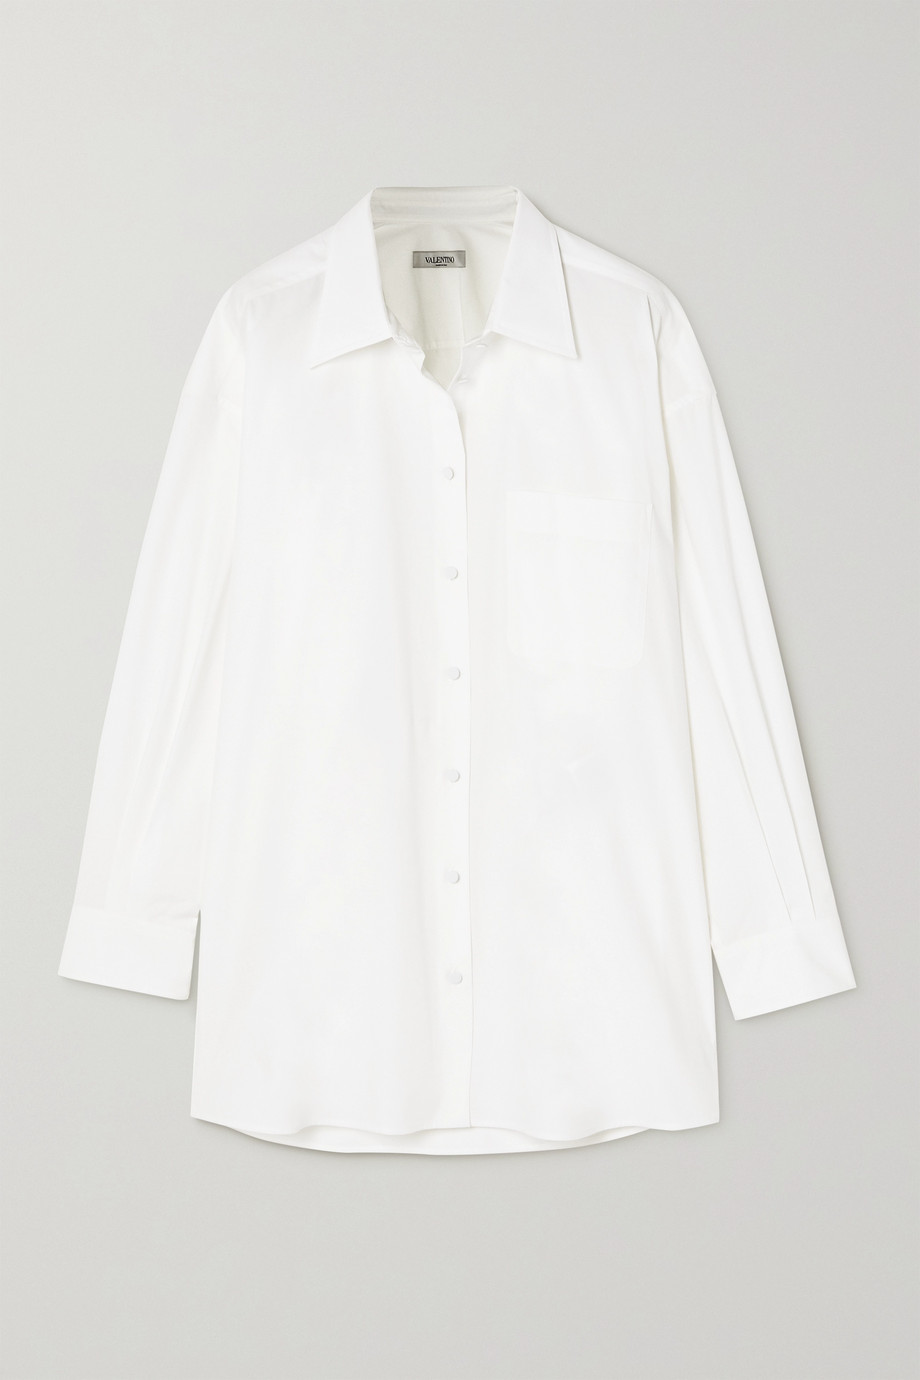 Valentino Hemd aus Baumwollpopeline